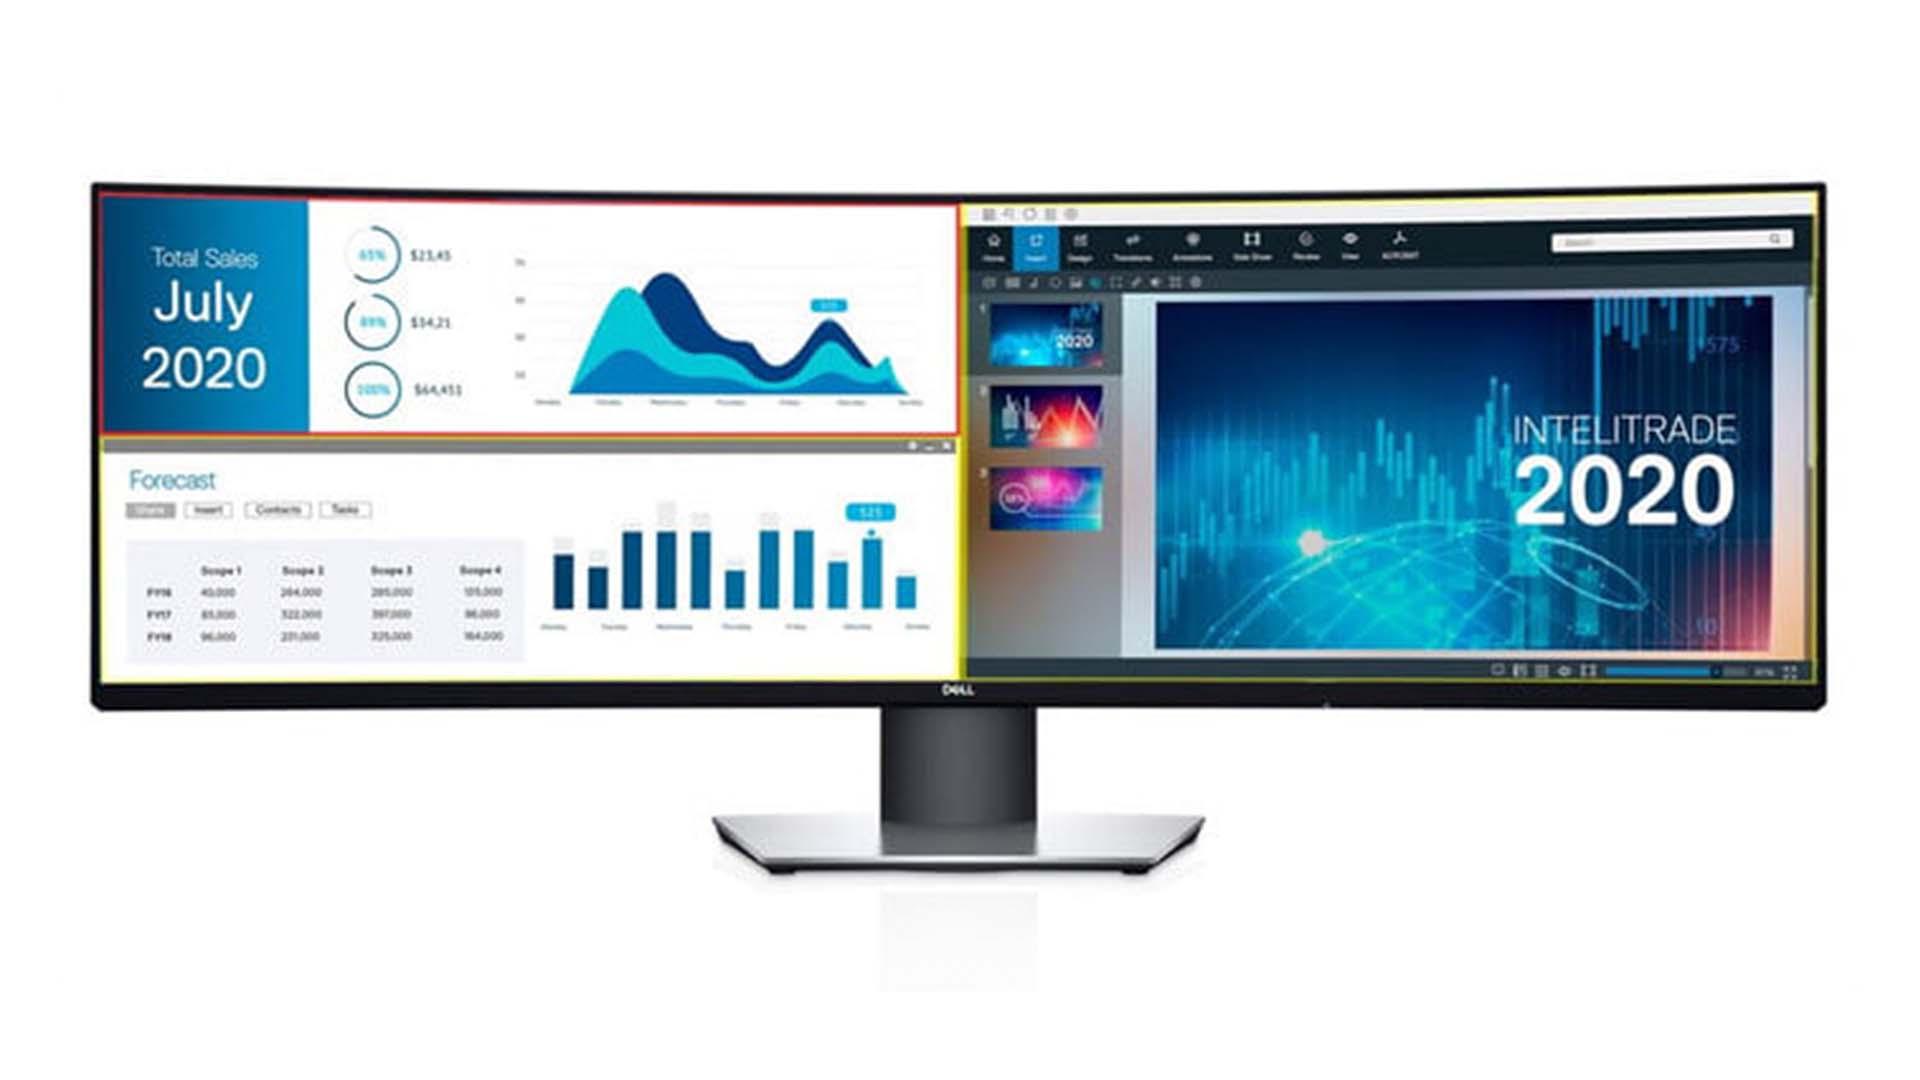 Dell UltraSharp 系列螢幕加入 49 吋,32:9,3800R 曲面螢幕 | Techritual Hong Kong - 香港 No.2 科技資訊網站